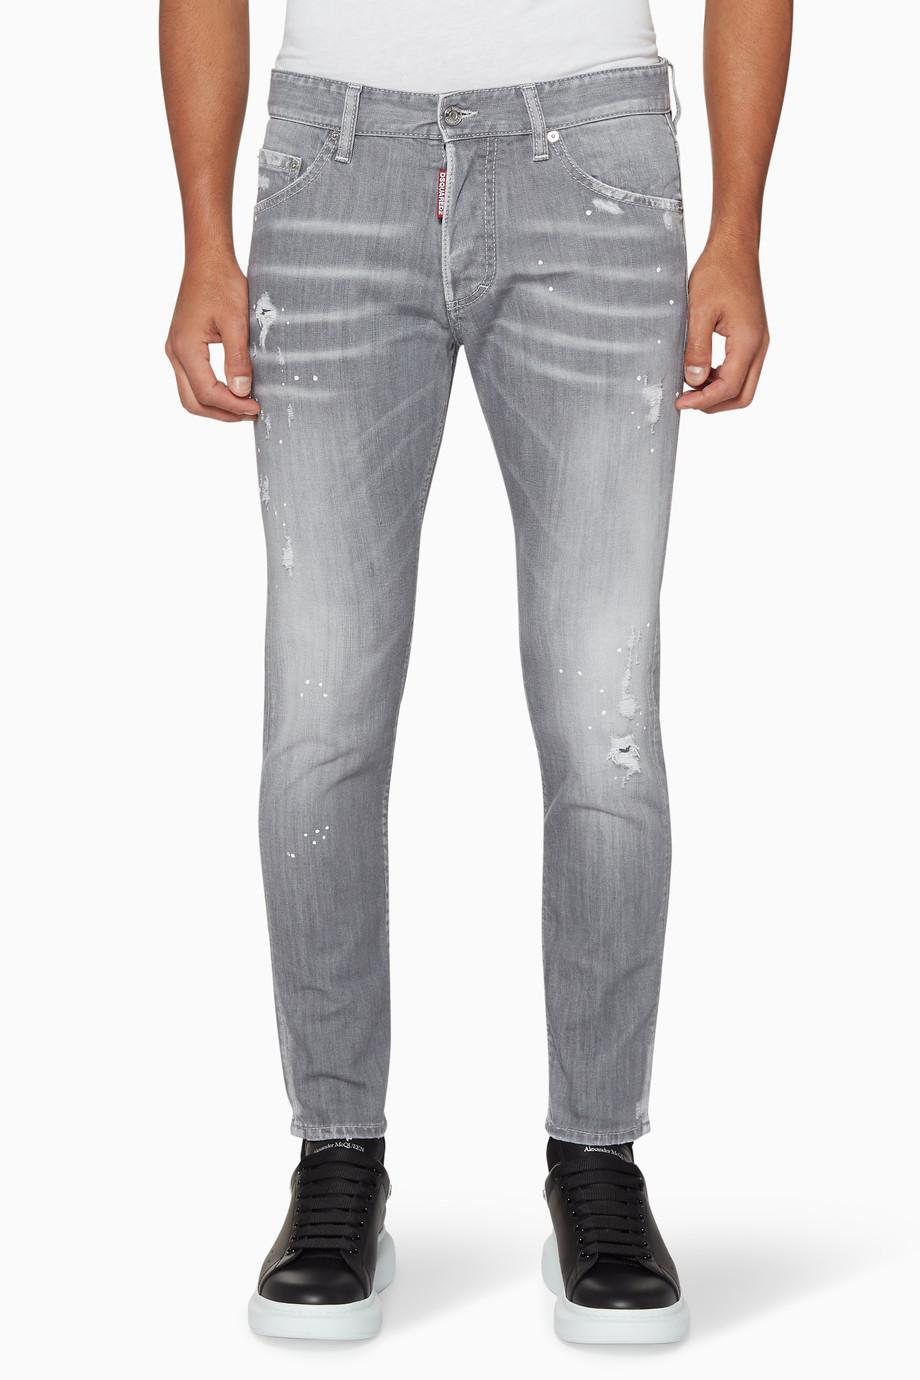 312e8a2e68 Shop Dsquared2 Grey Light-Grey Distressed Skinny Jeans for Men